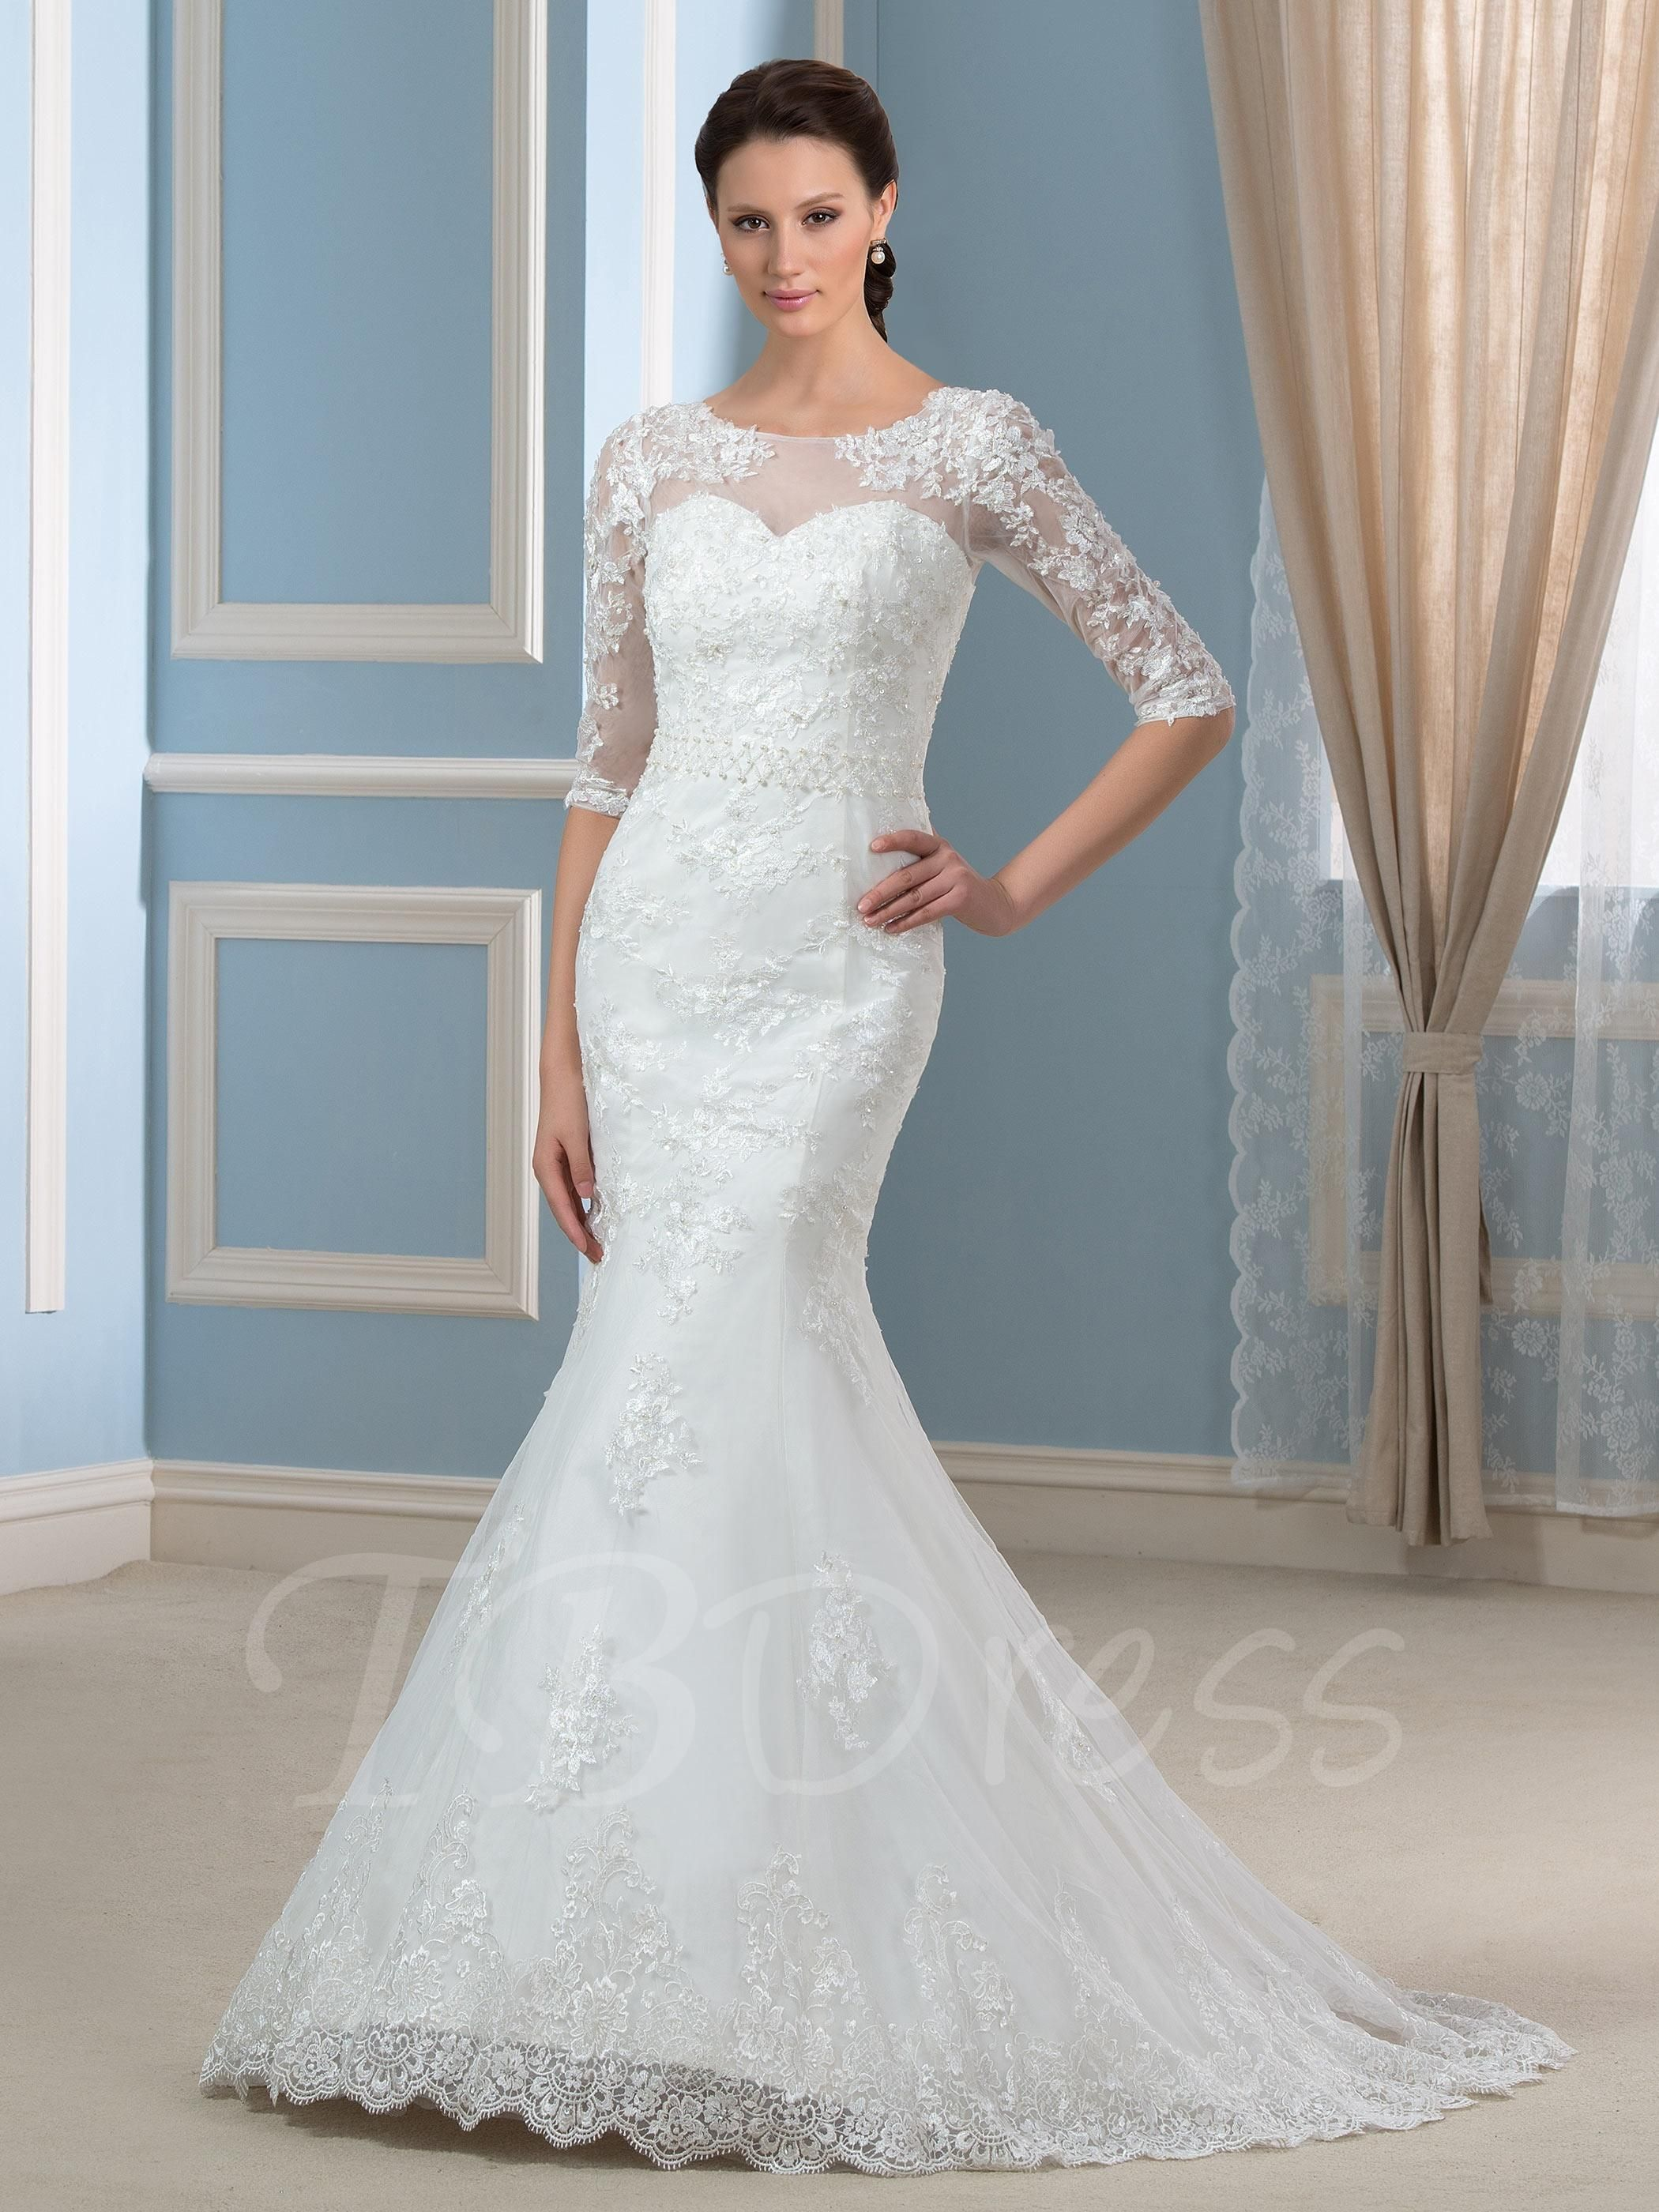 Bfcm Cybermonday Tbdress Tbdress Modest Half Sleeves Beading Lace Court Train Trumpe Court Train Wedding Dress Lace Mermaid Wedding Dress Wedding Dresses [ 2800 x 2100 Pixel ]